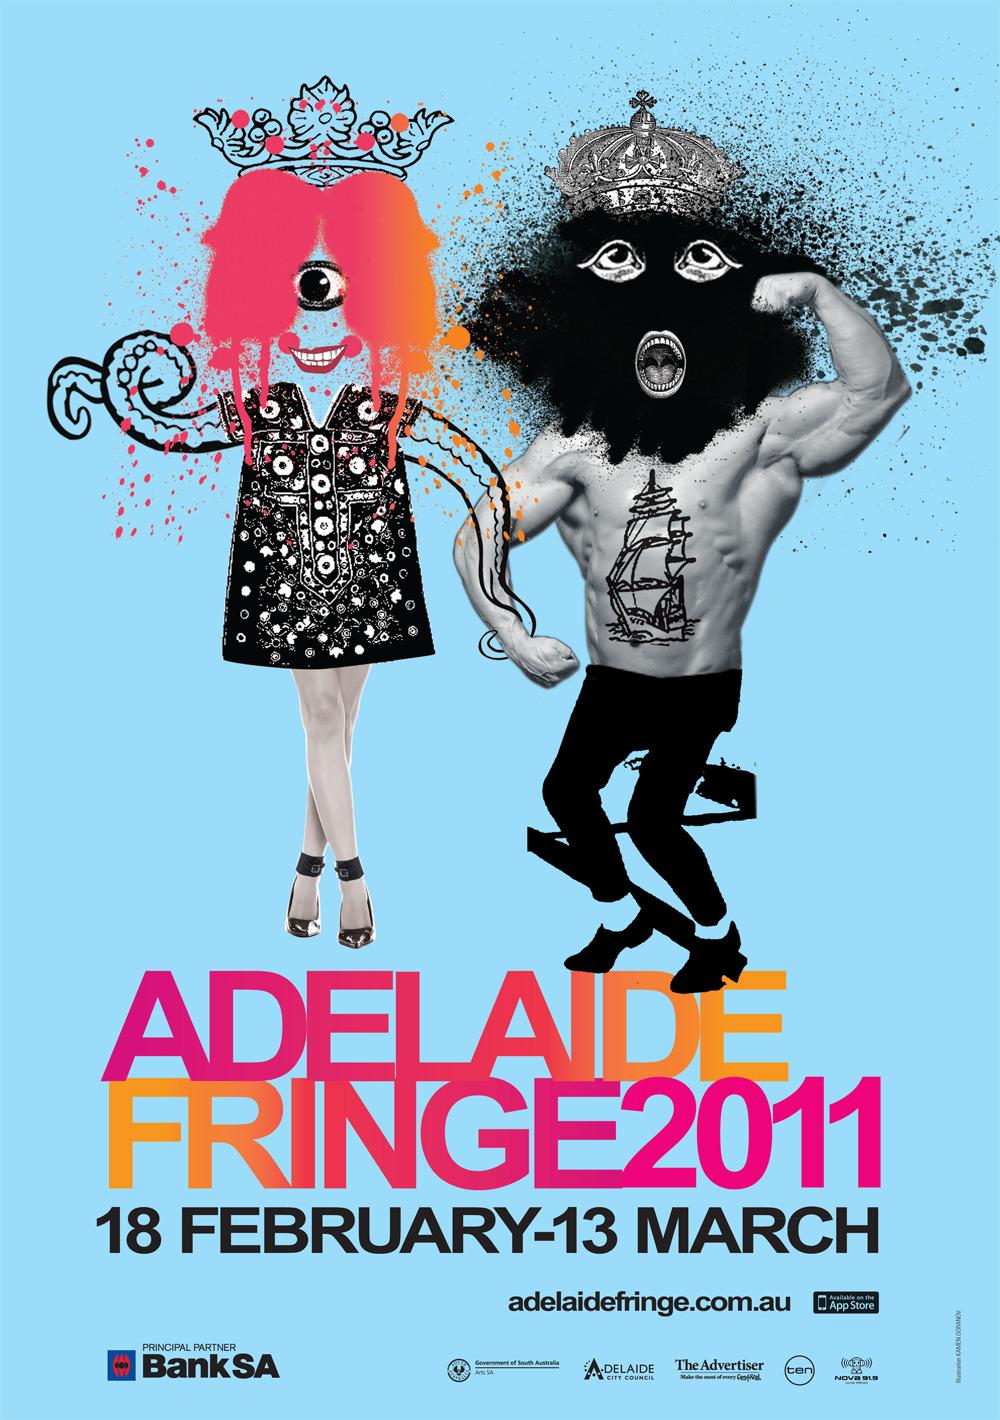 Cartel del Adelaide Fringe Festival 2011